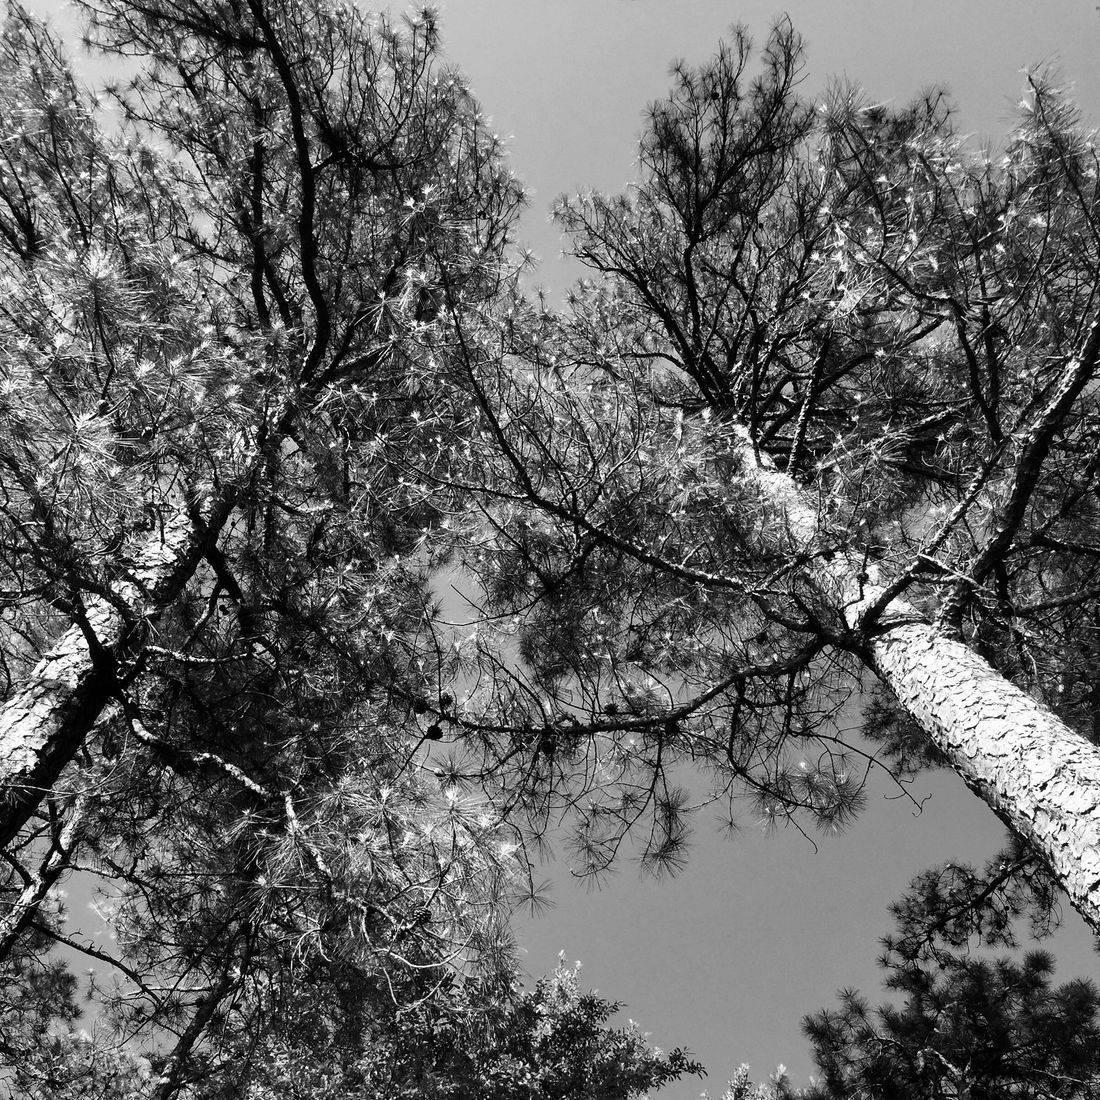 Trees, Sky, Pine